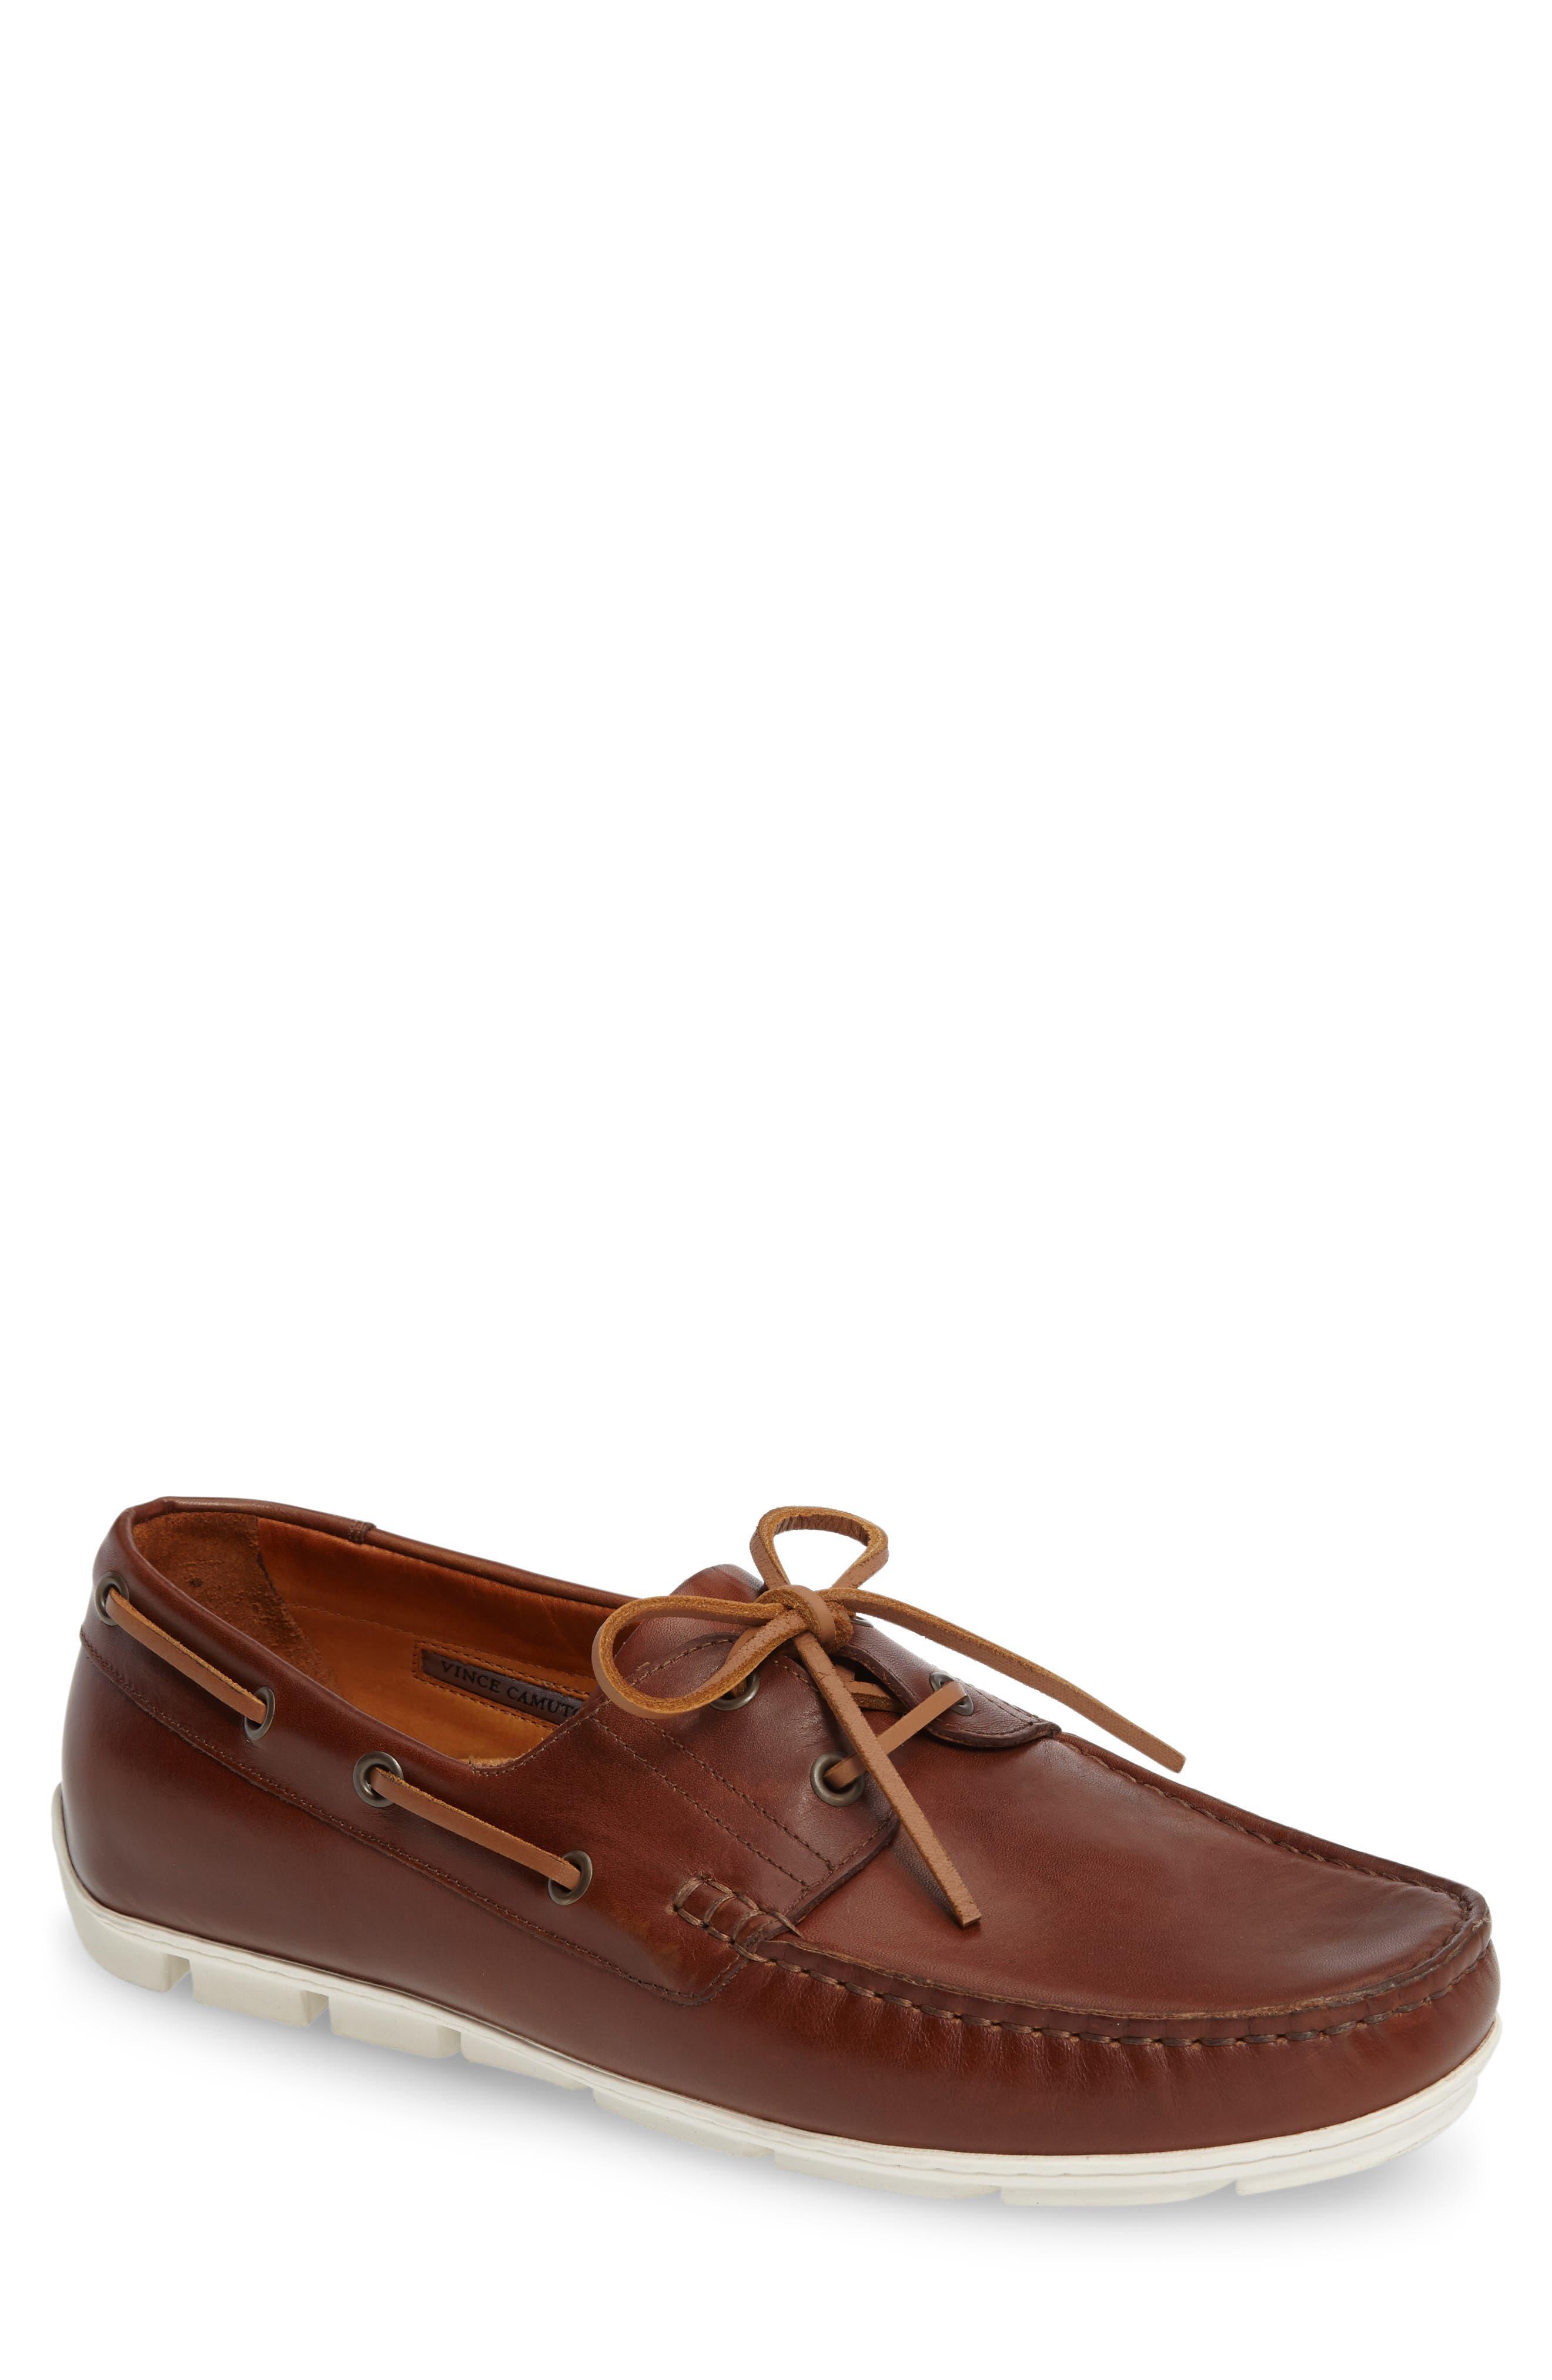 Don Boat Shoe,                         Main,                         color, 240